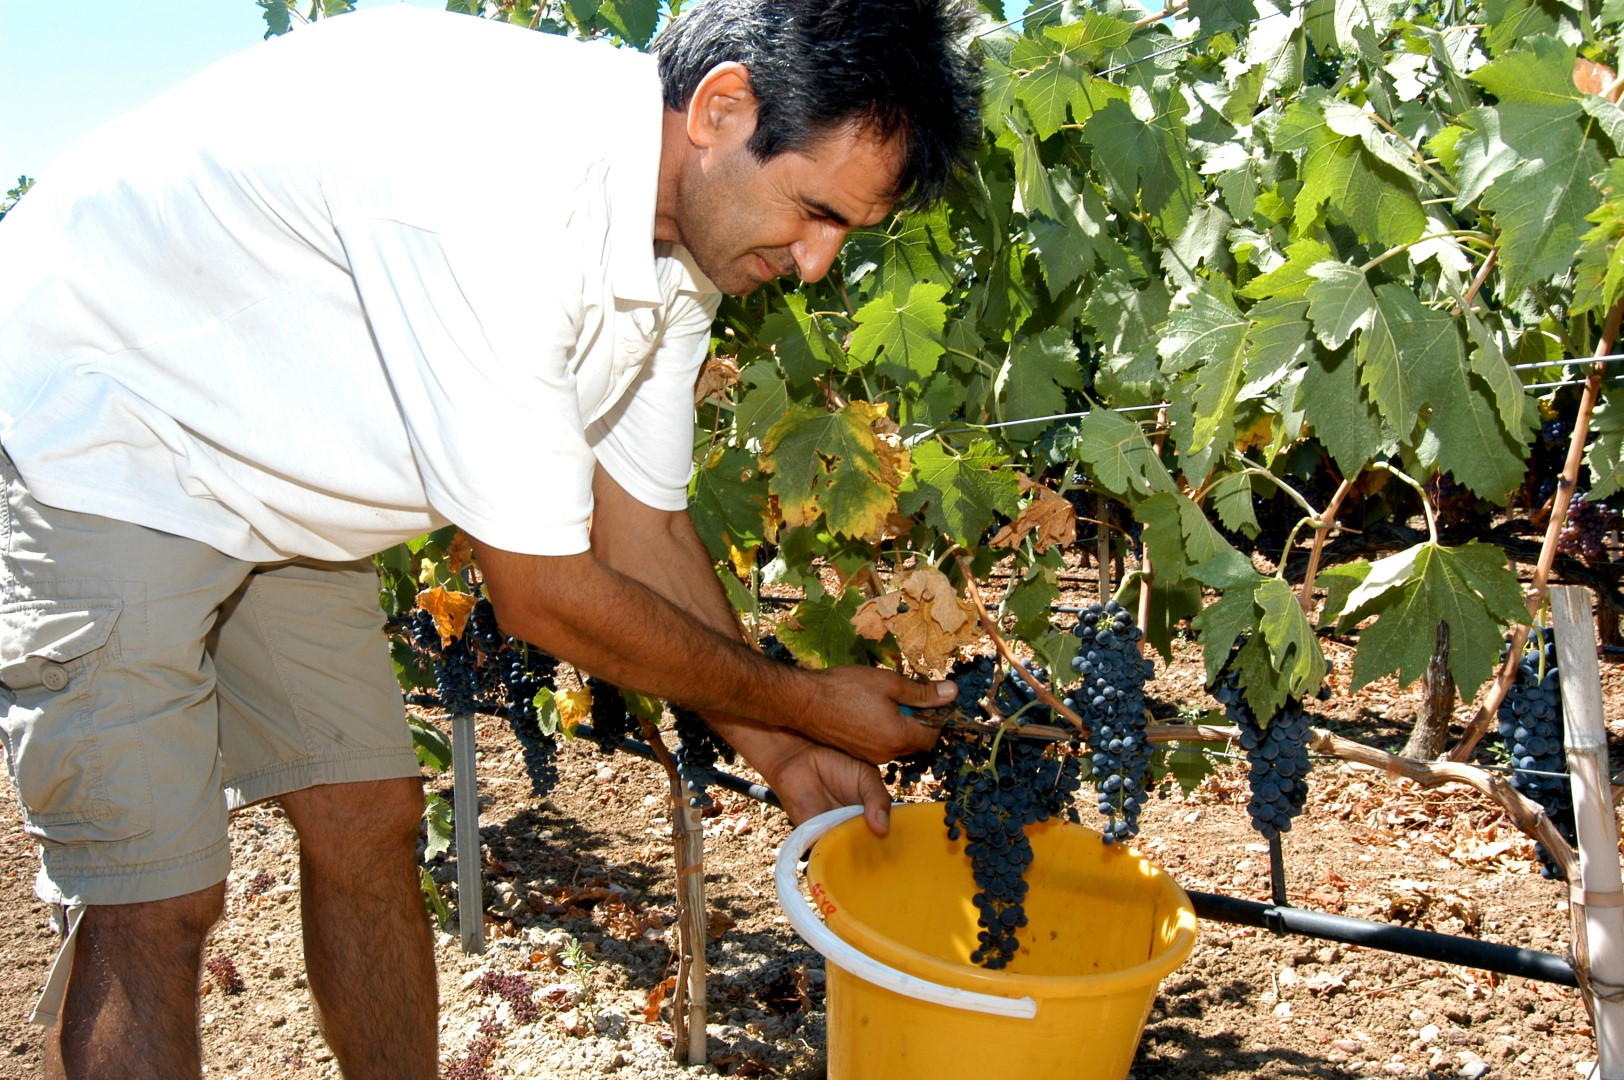 Kos wines from Hatziemmanouil picking grapes